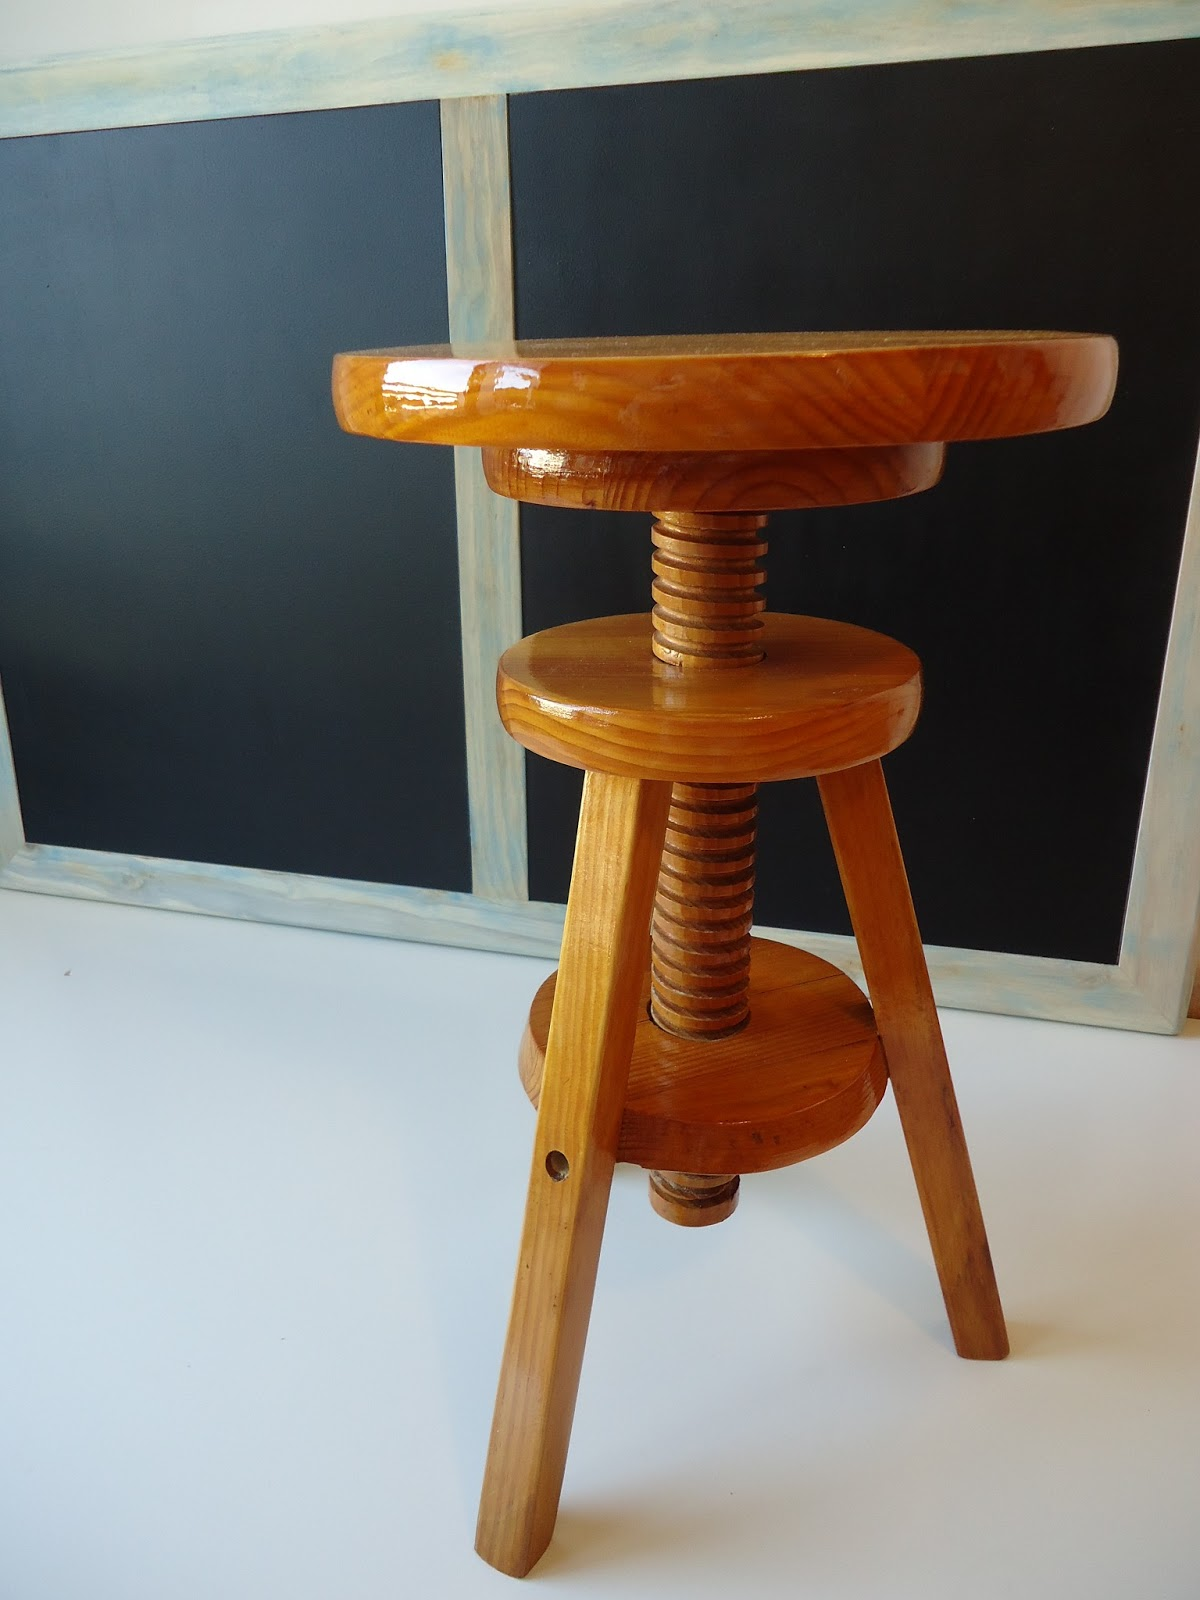 T bano vintage taburete pintor de madera tono miel vendido - Taburete madera regulable ...